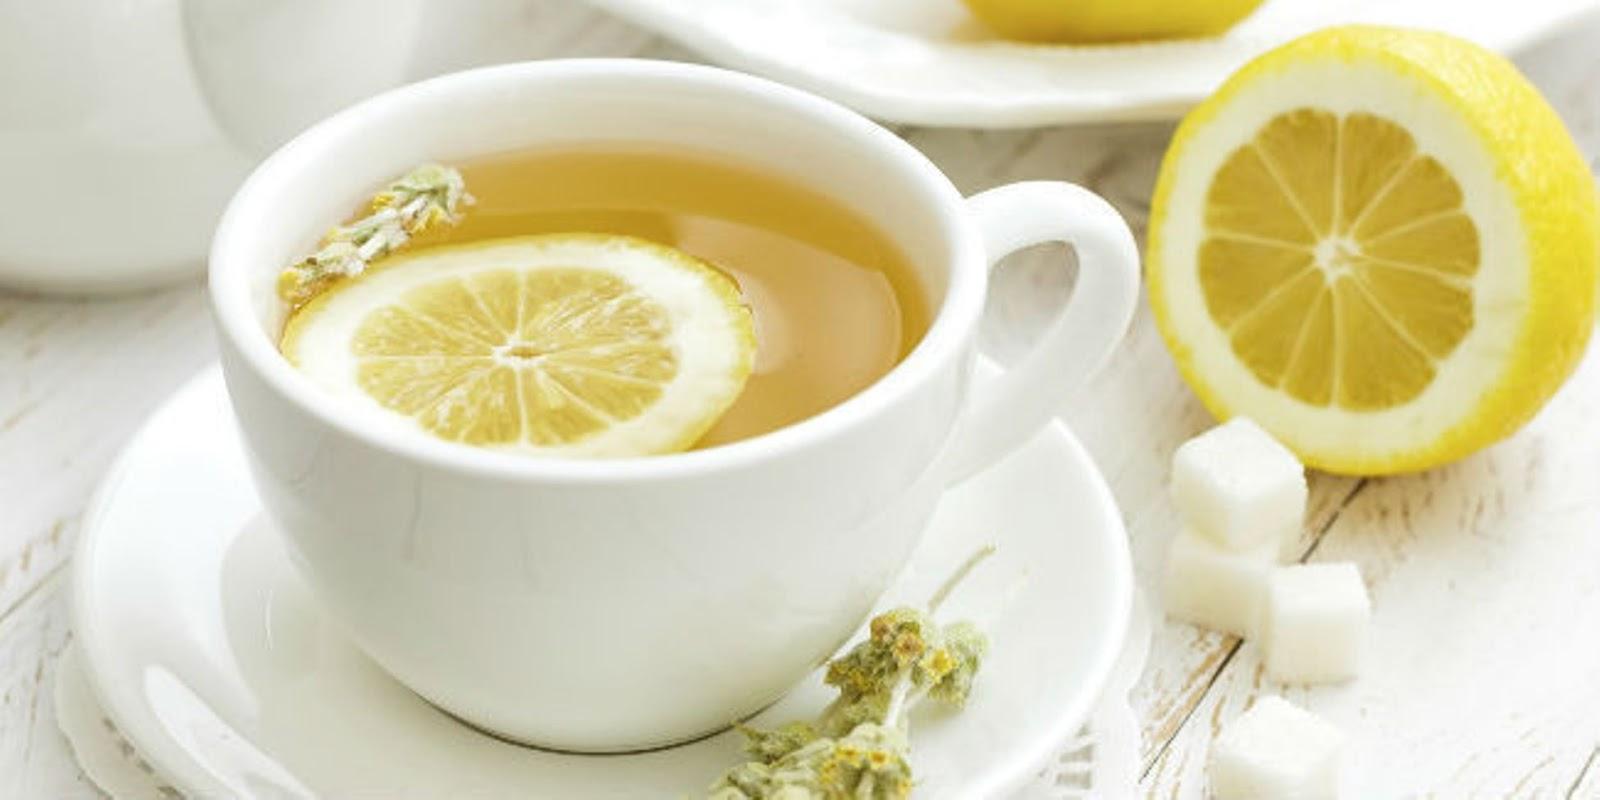 Cara Sehat Mengisi Pagi Harimu dengan Kegembiraan